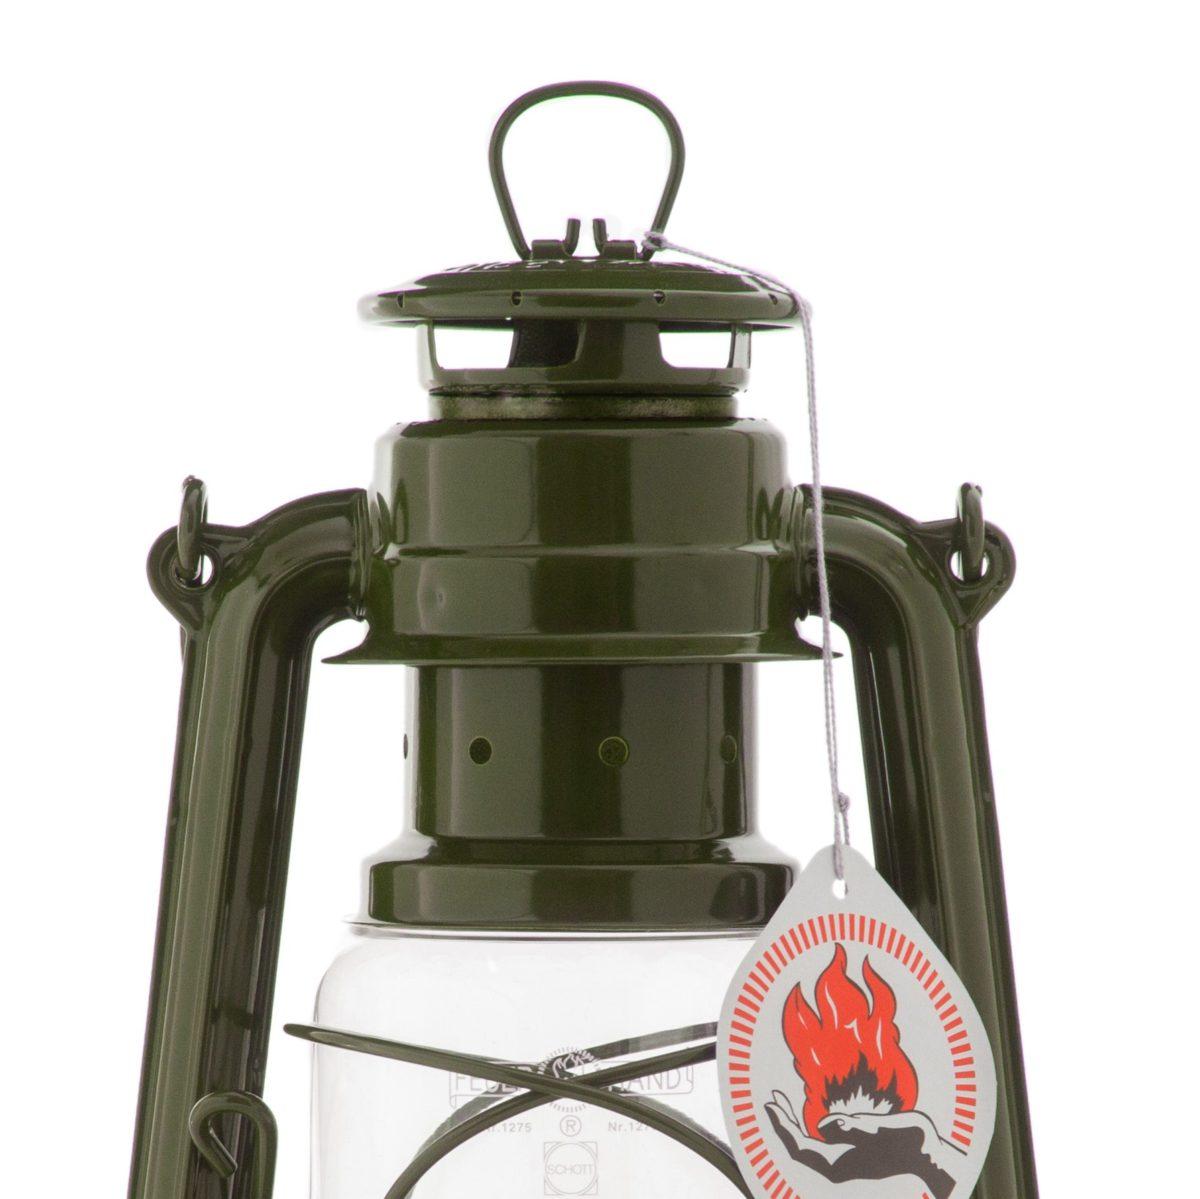 Feuerhand Hurricane Lanterns for sale in Olive Green ...